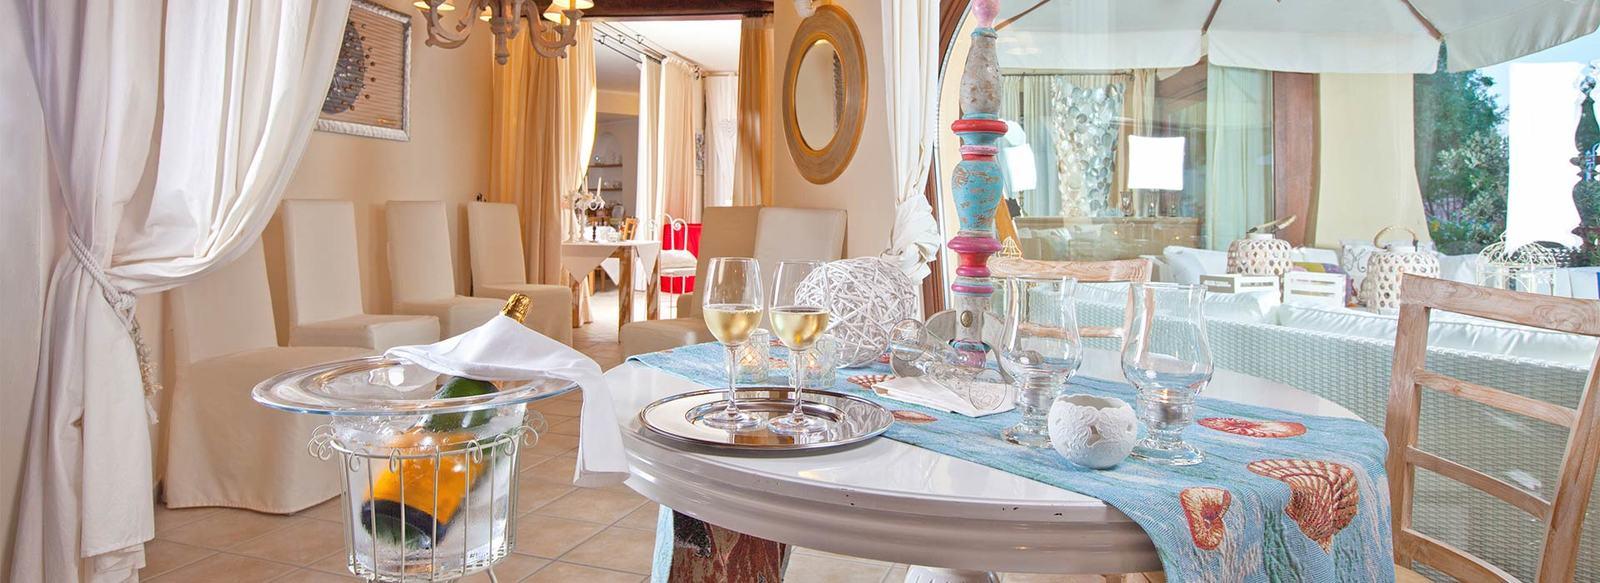 Stile mediterraneo, tra gusto ed eleganza